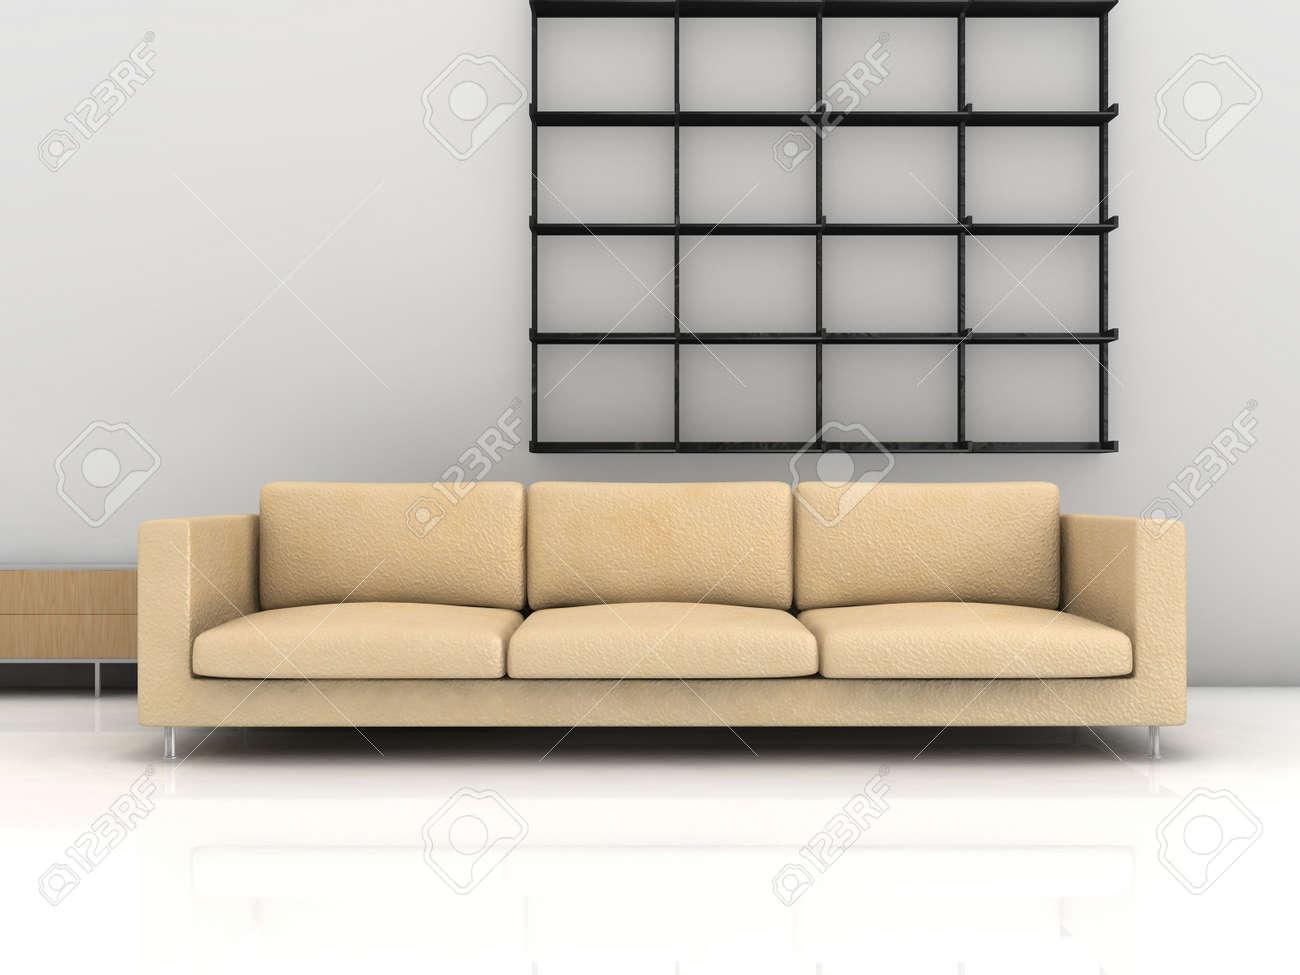 Living Room Living Room Setting minimalist living room setting scene couch and rack stock photo rack